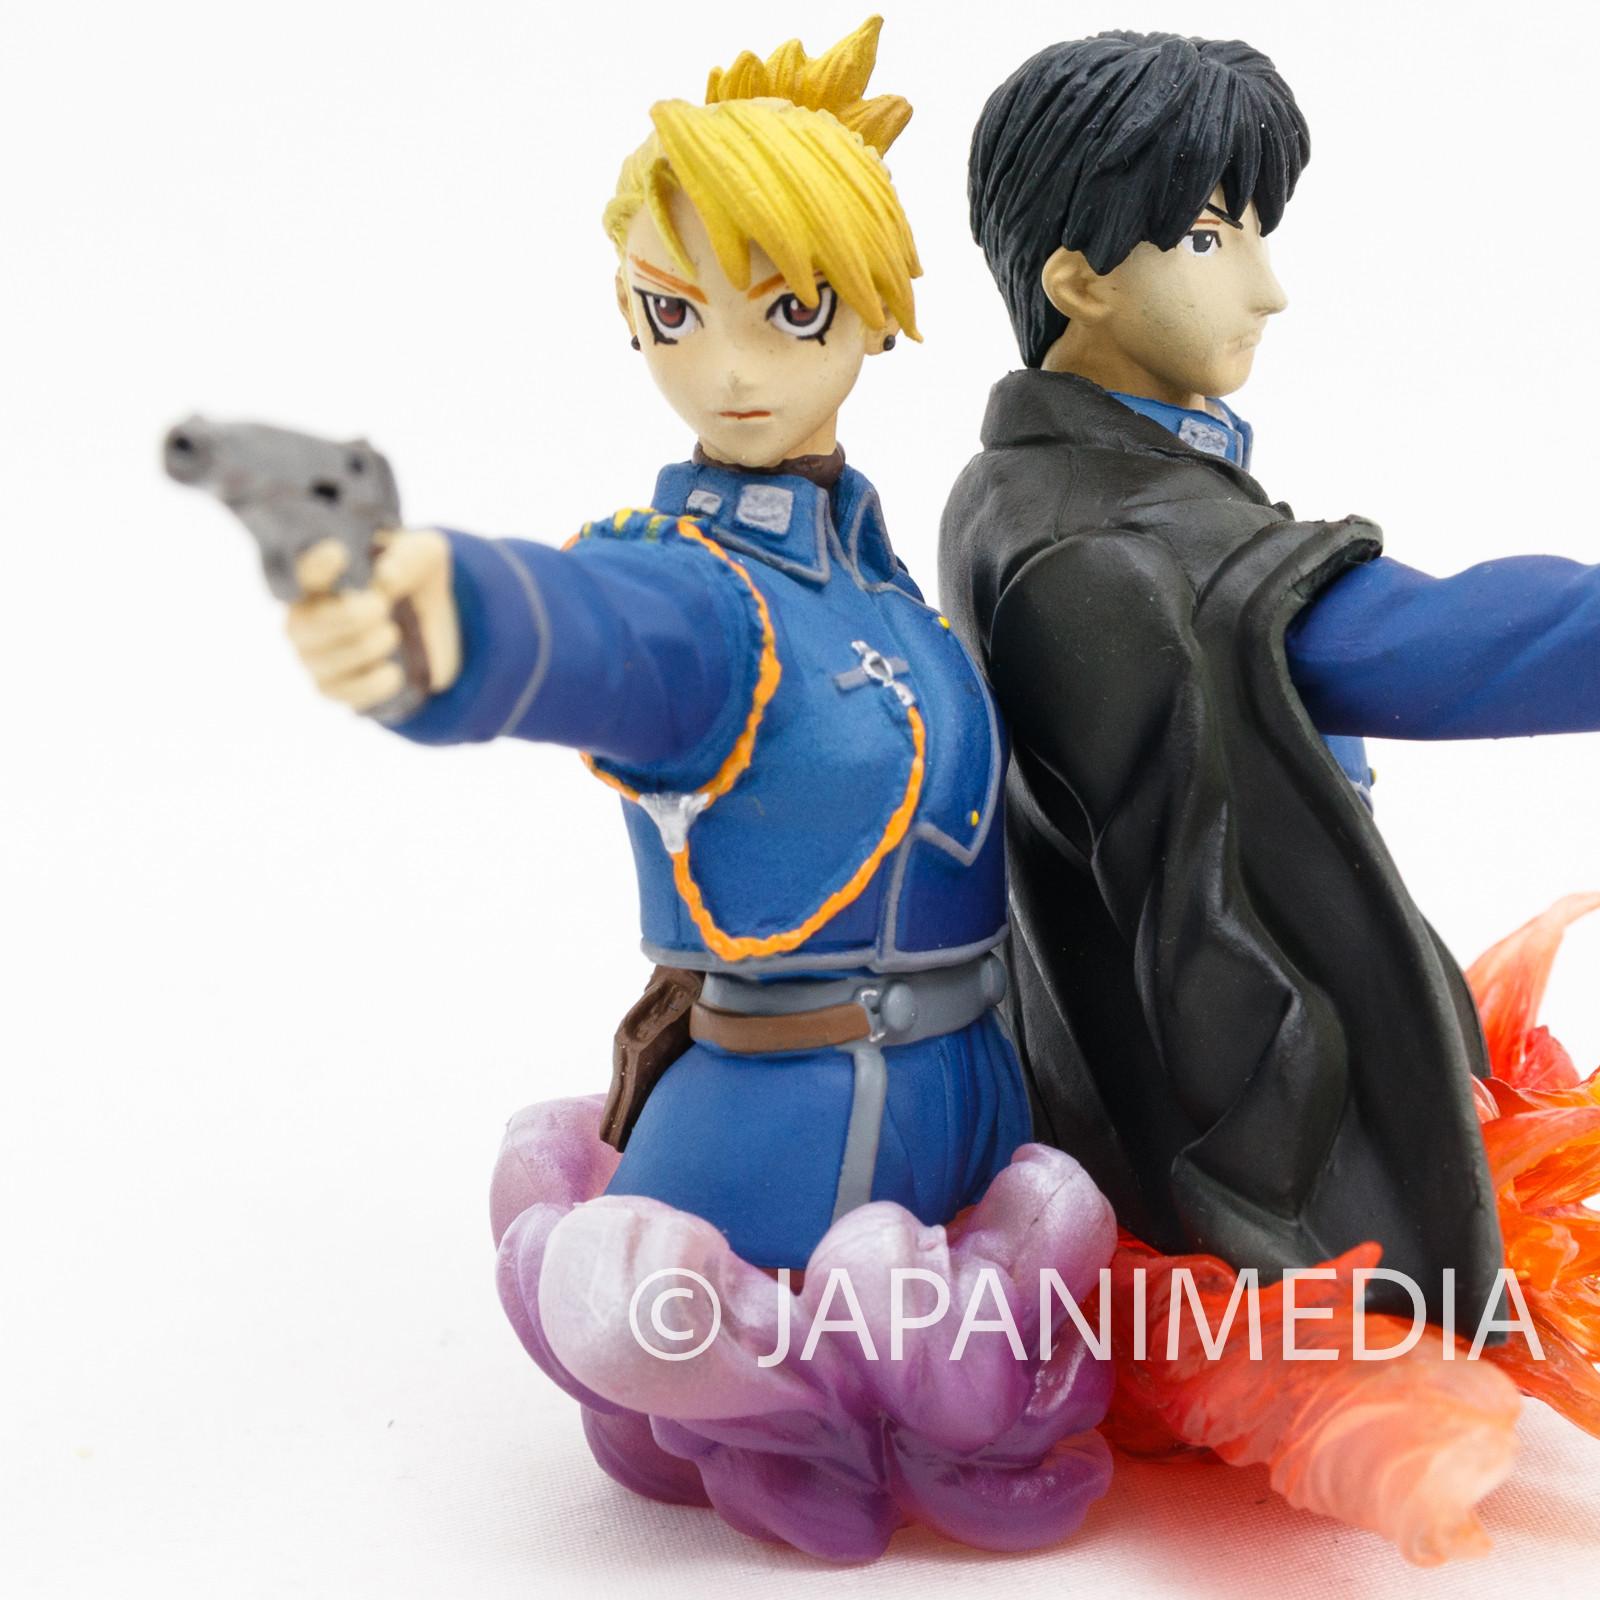 Fullmetal Alchemist Roy Mustang & Riza Hawkeye Mini Diorama Figure JAPAN